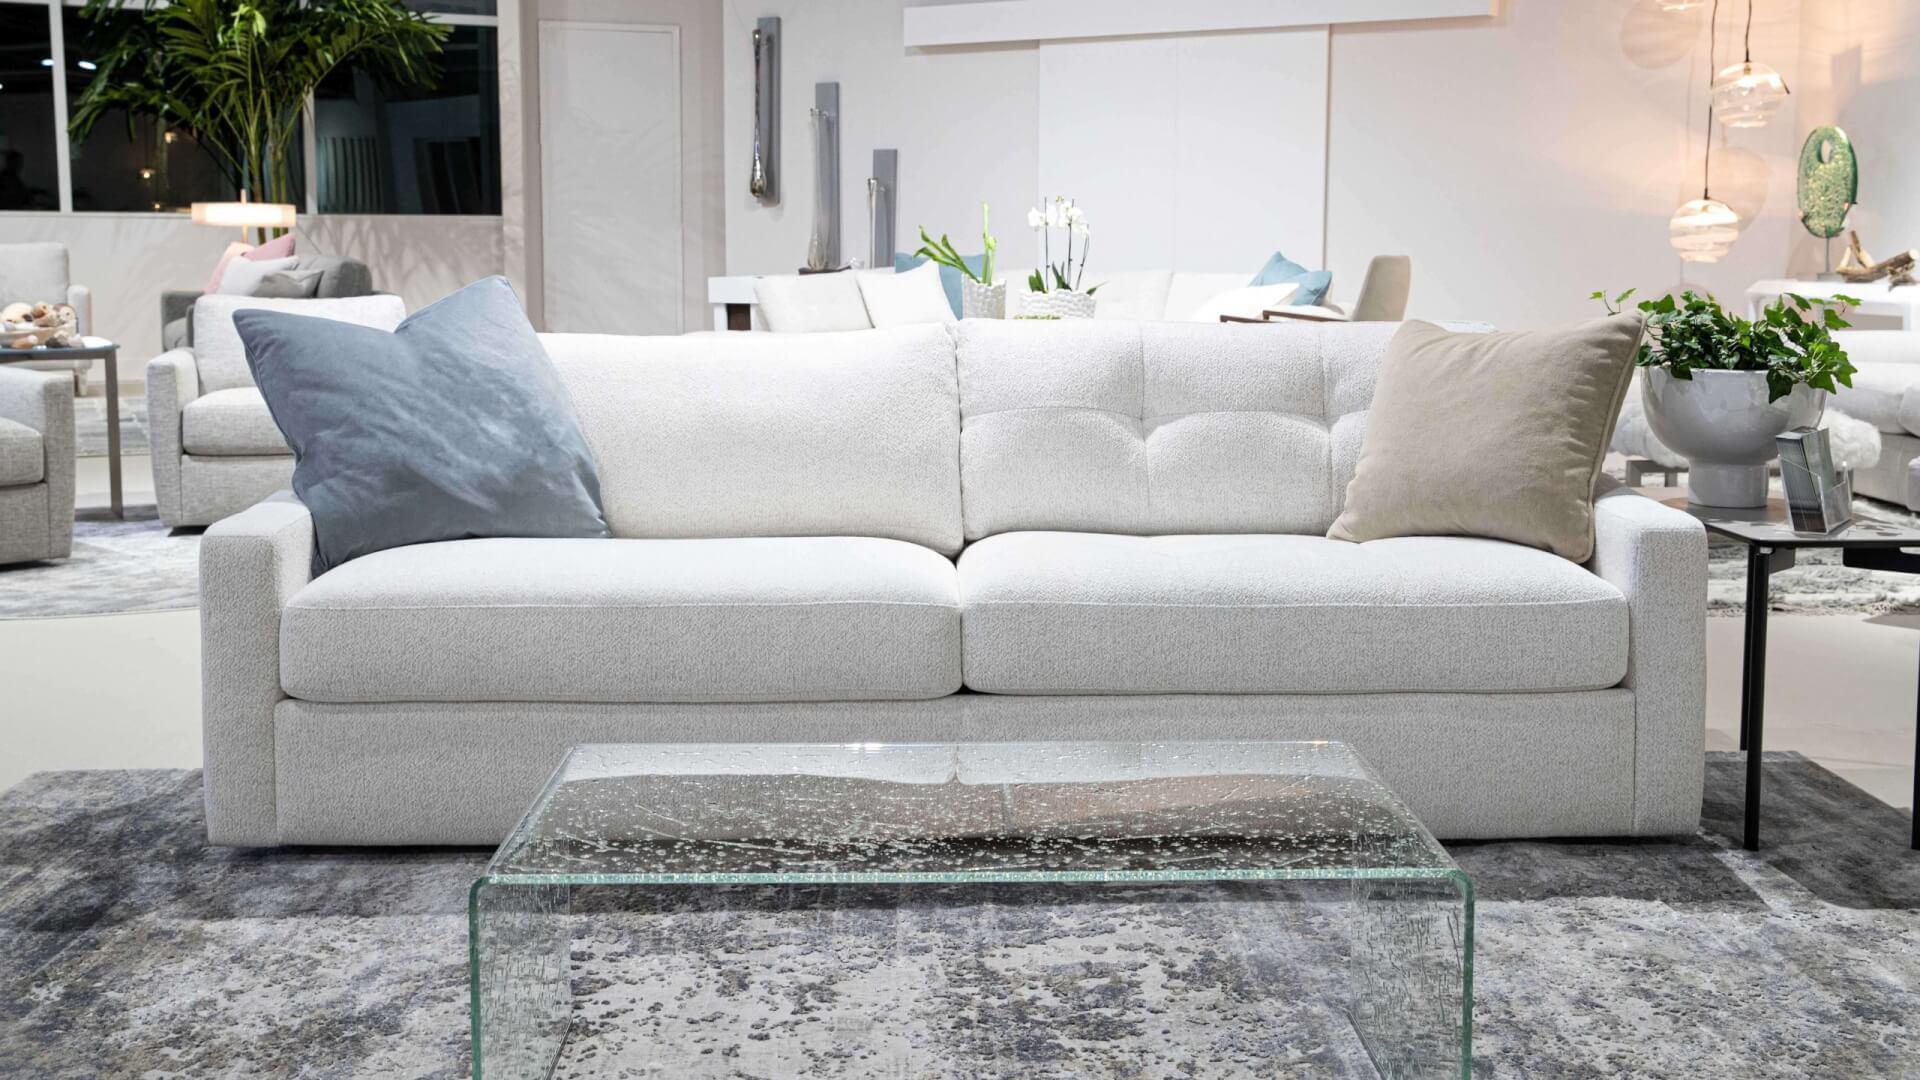 Doran-sofa-room-shot